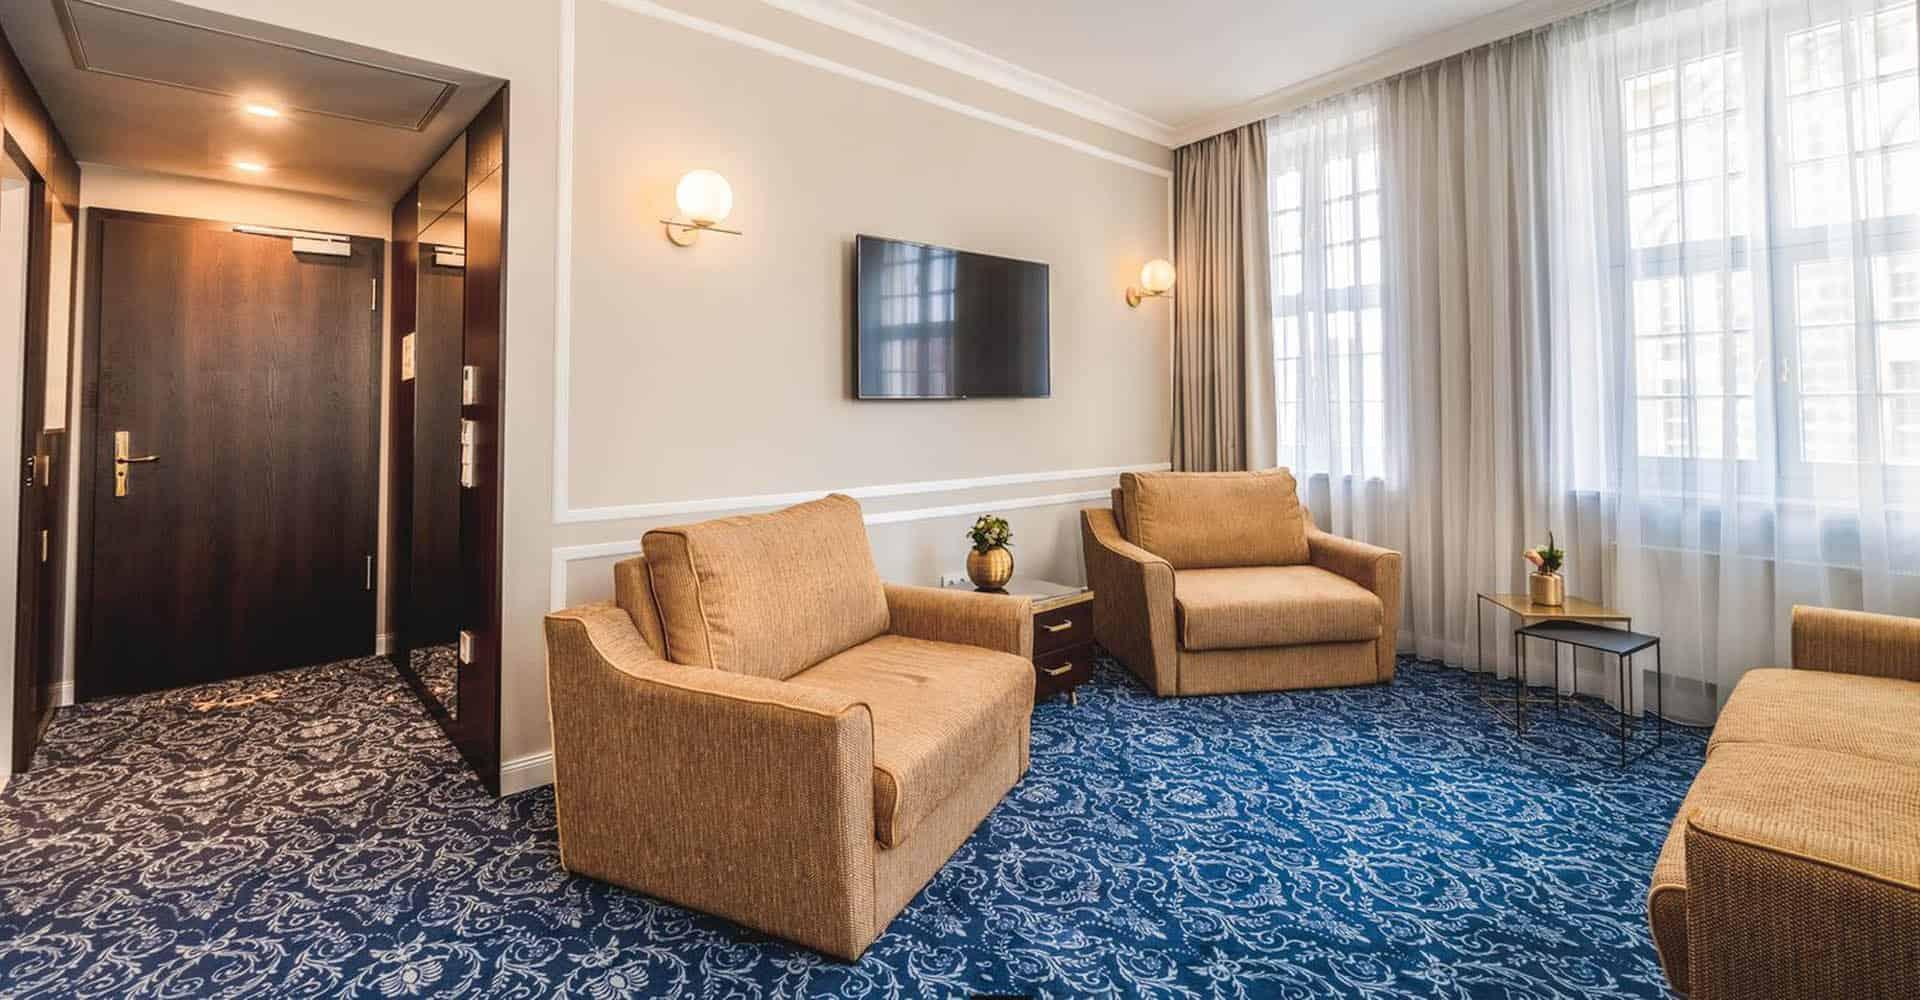 Hotel Suitess, Handwerk, Haustechnik, Luxushotel, Dresden, Kadur Gruppe